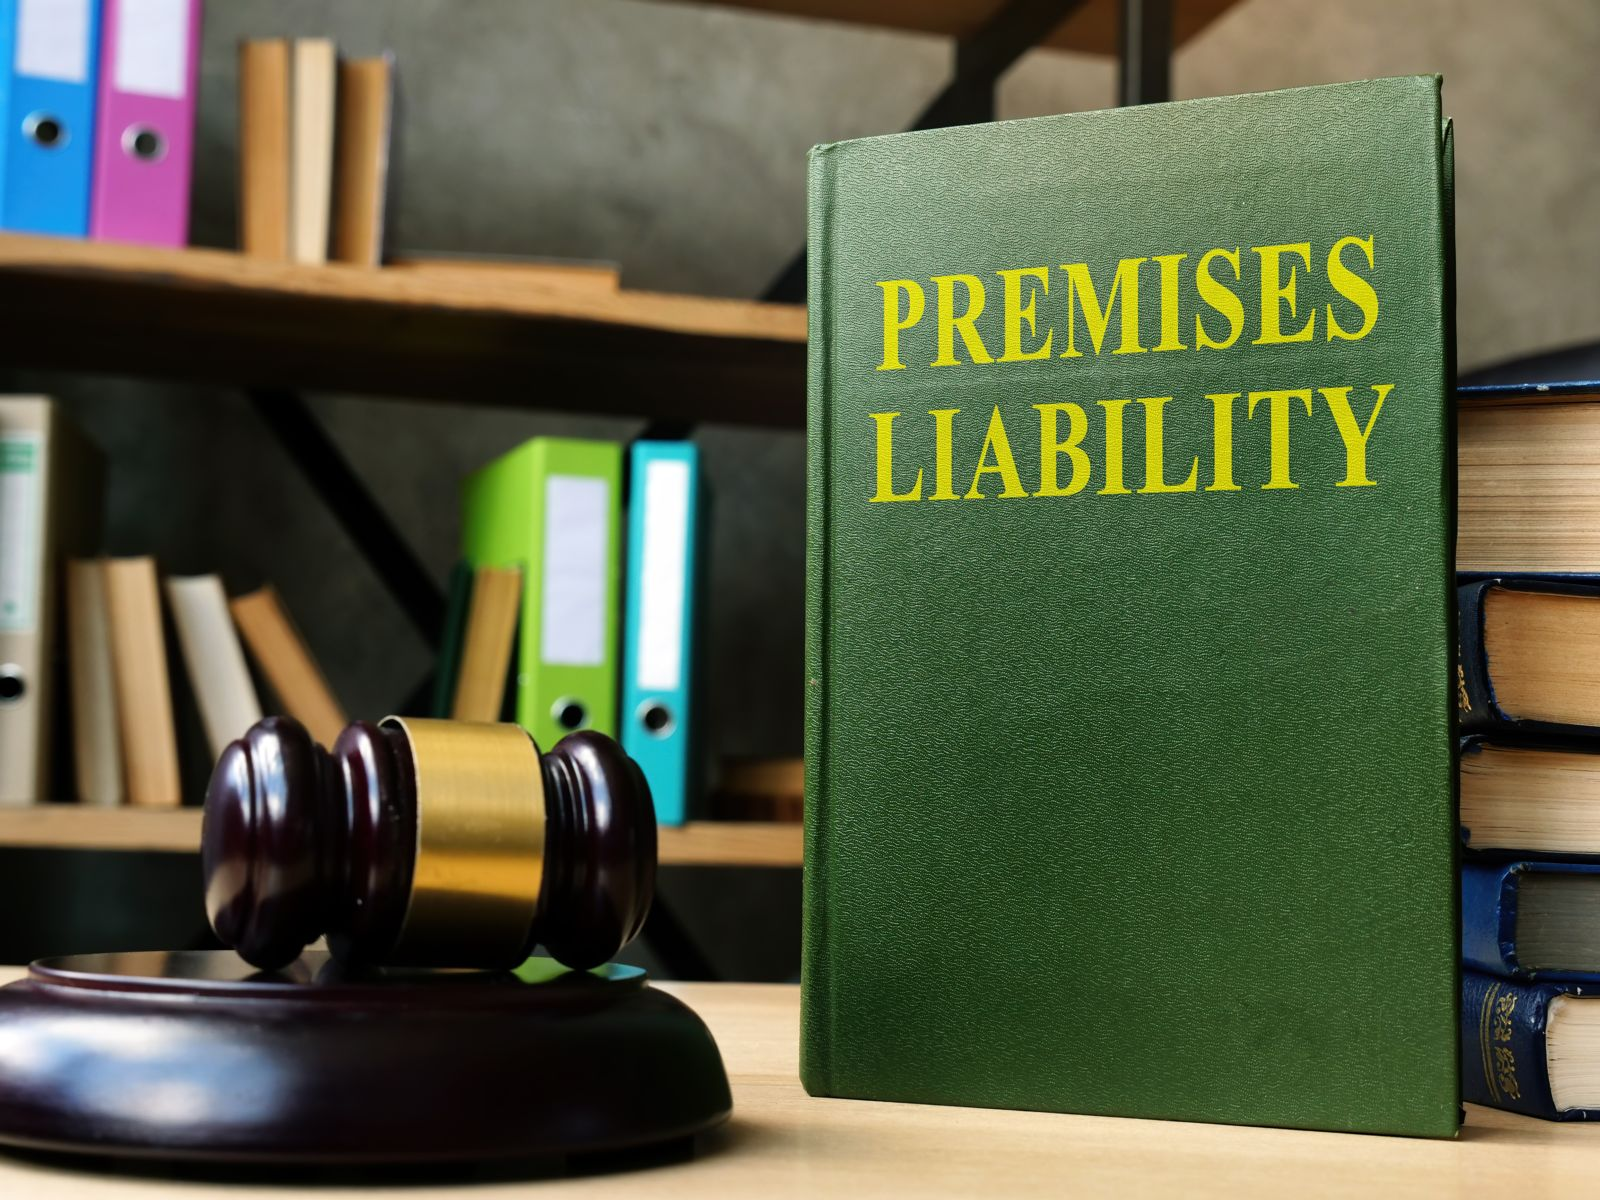 Florida Premises Liability Lawyer Rosenberg Law Firm